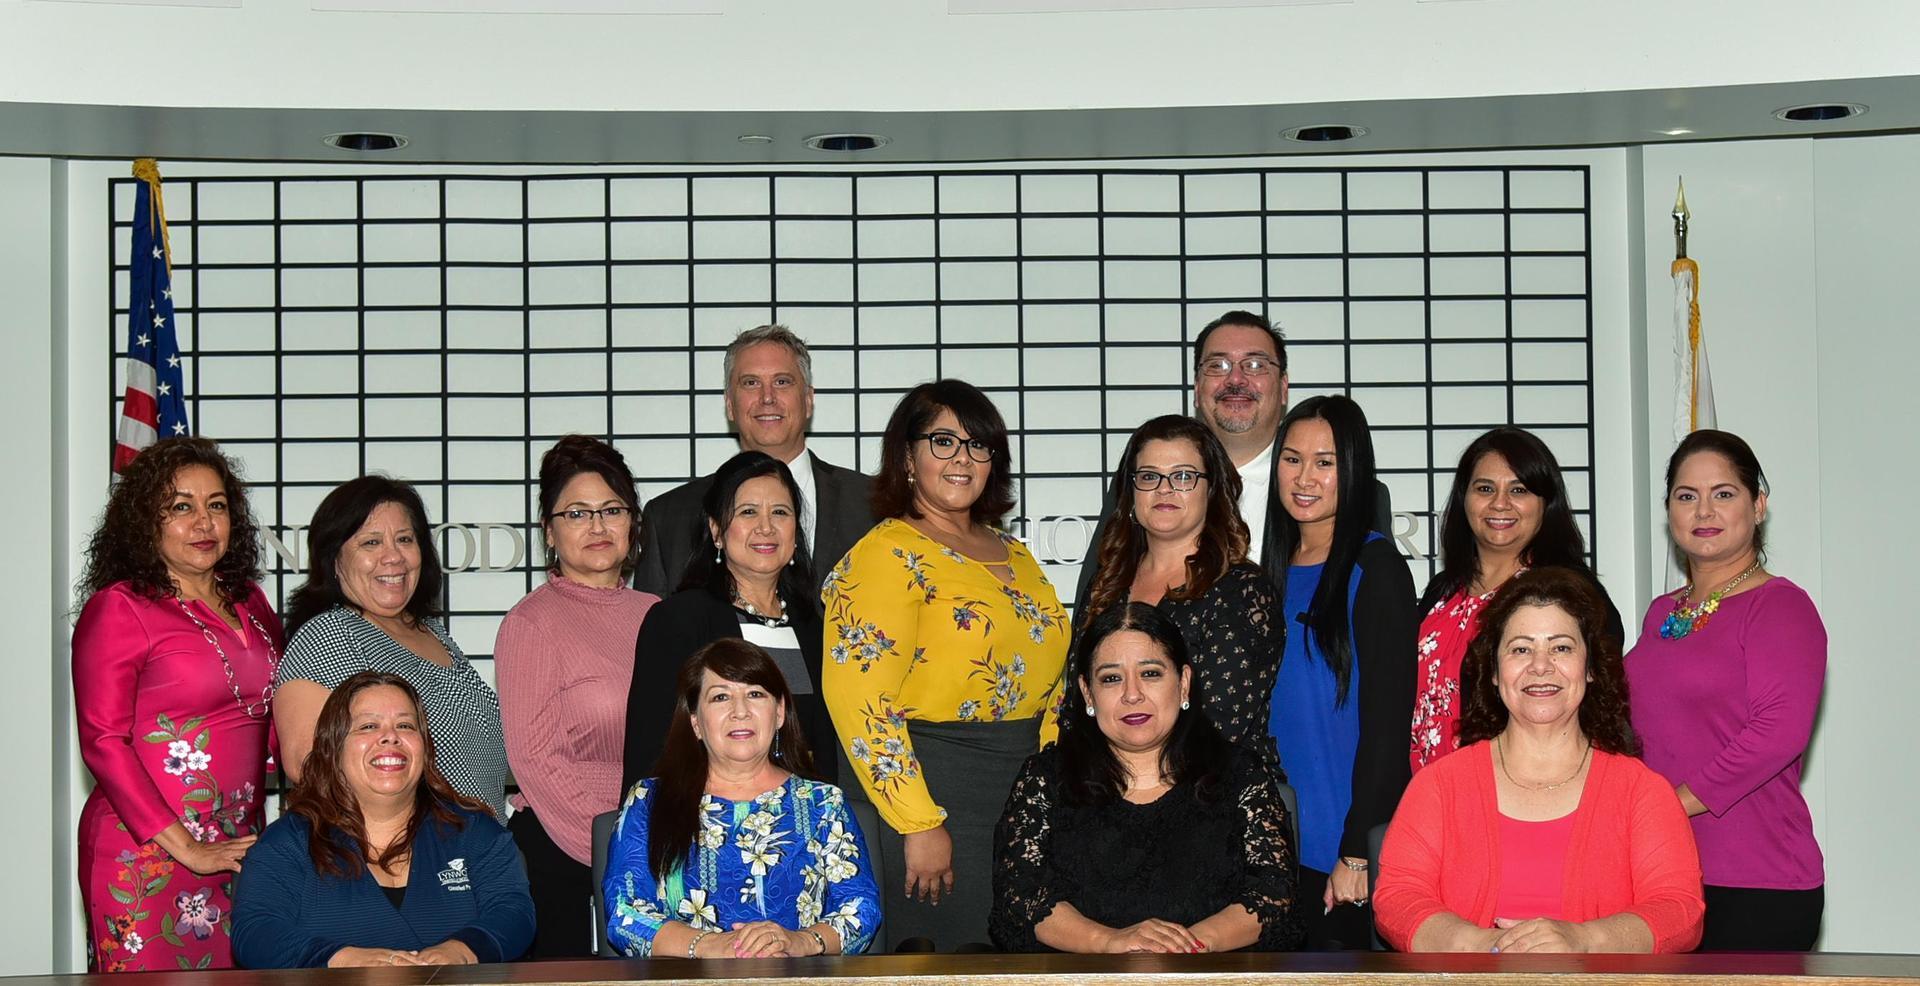 Human Resources Staff Photo